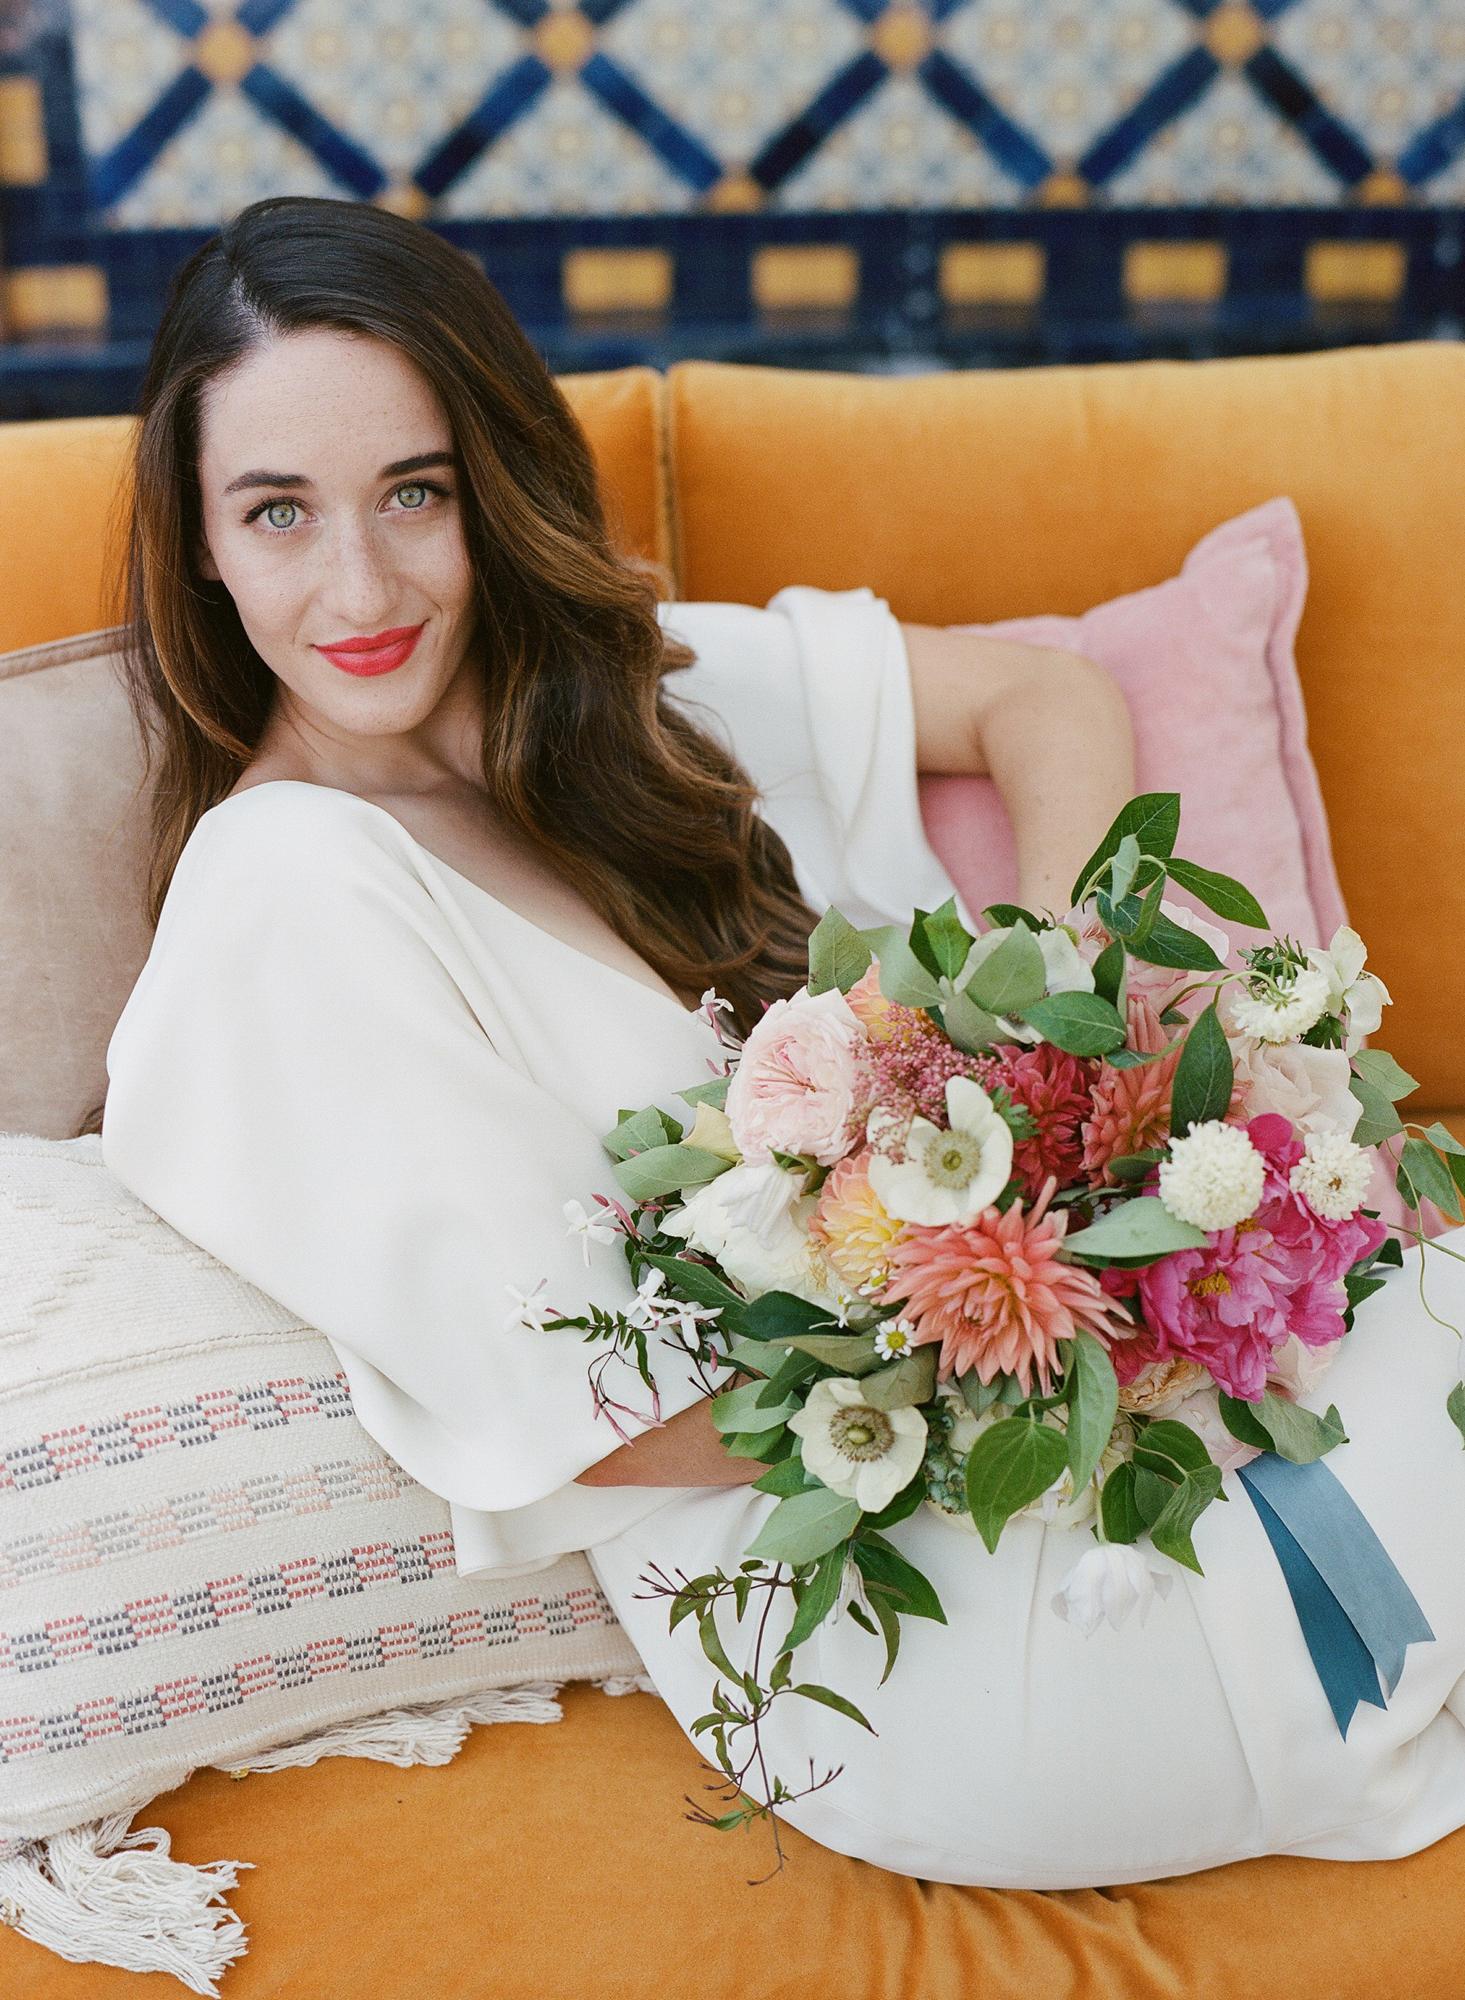 Rancho-Valencia-wedding-blooms-by-breesa-lee-rochelle-cheever-francine-ribeau-luxury-garden-rancho-santa-fe-hey-there-cupcake-adore-folklore-391.JPG